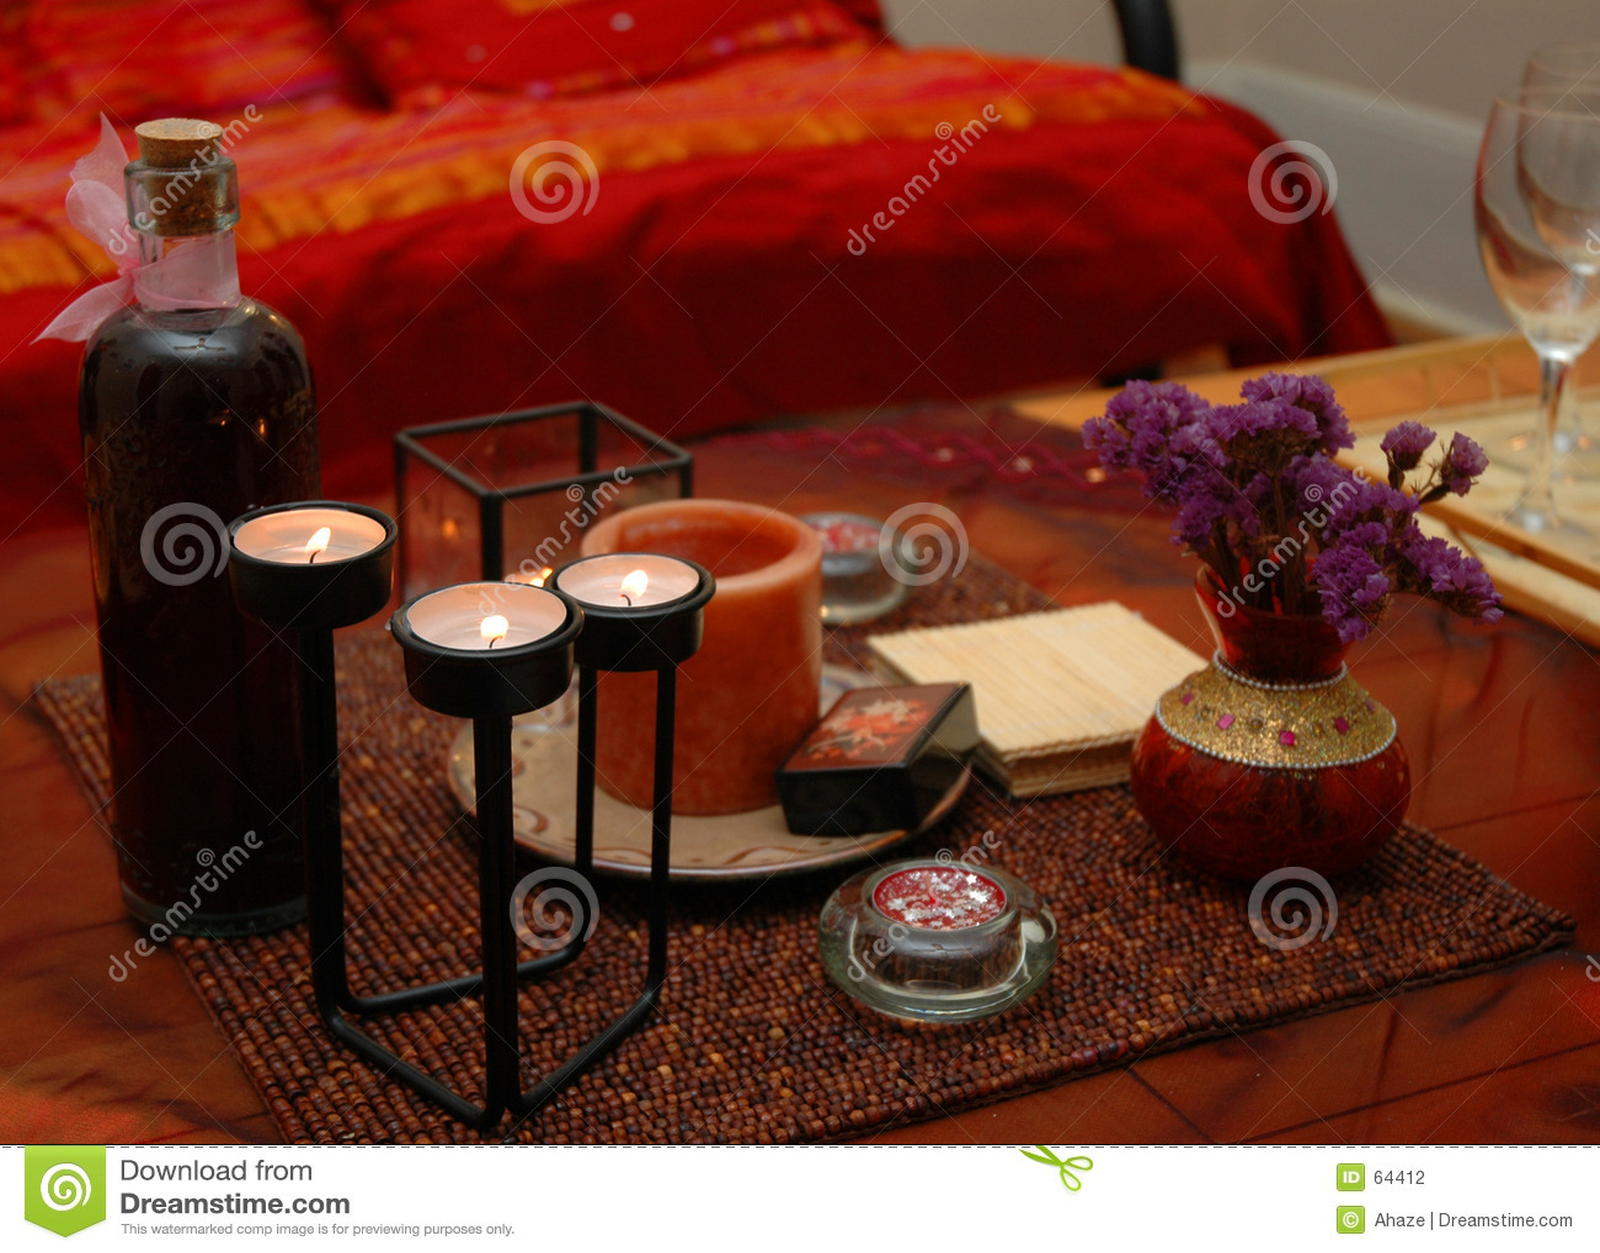 Download πίνακας σκηνής καφέ στοκ εικόνες. εικόνα από ύφος, wineglasses - 64412